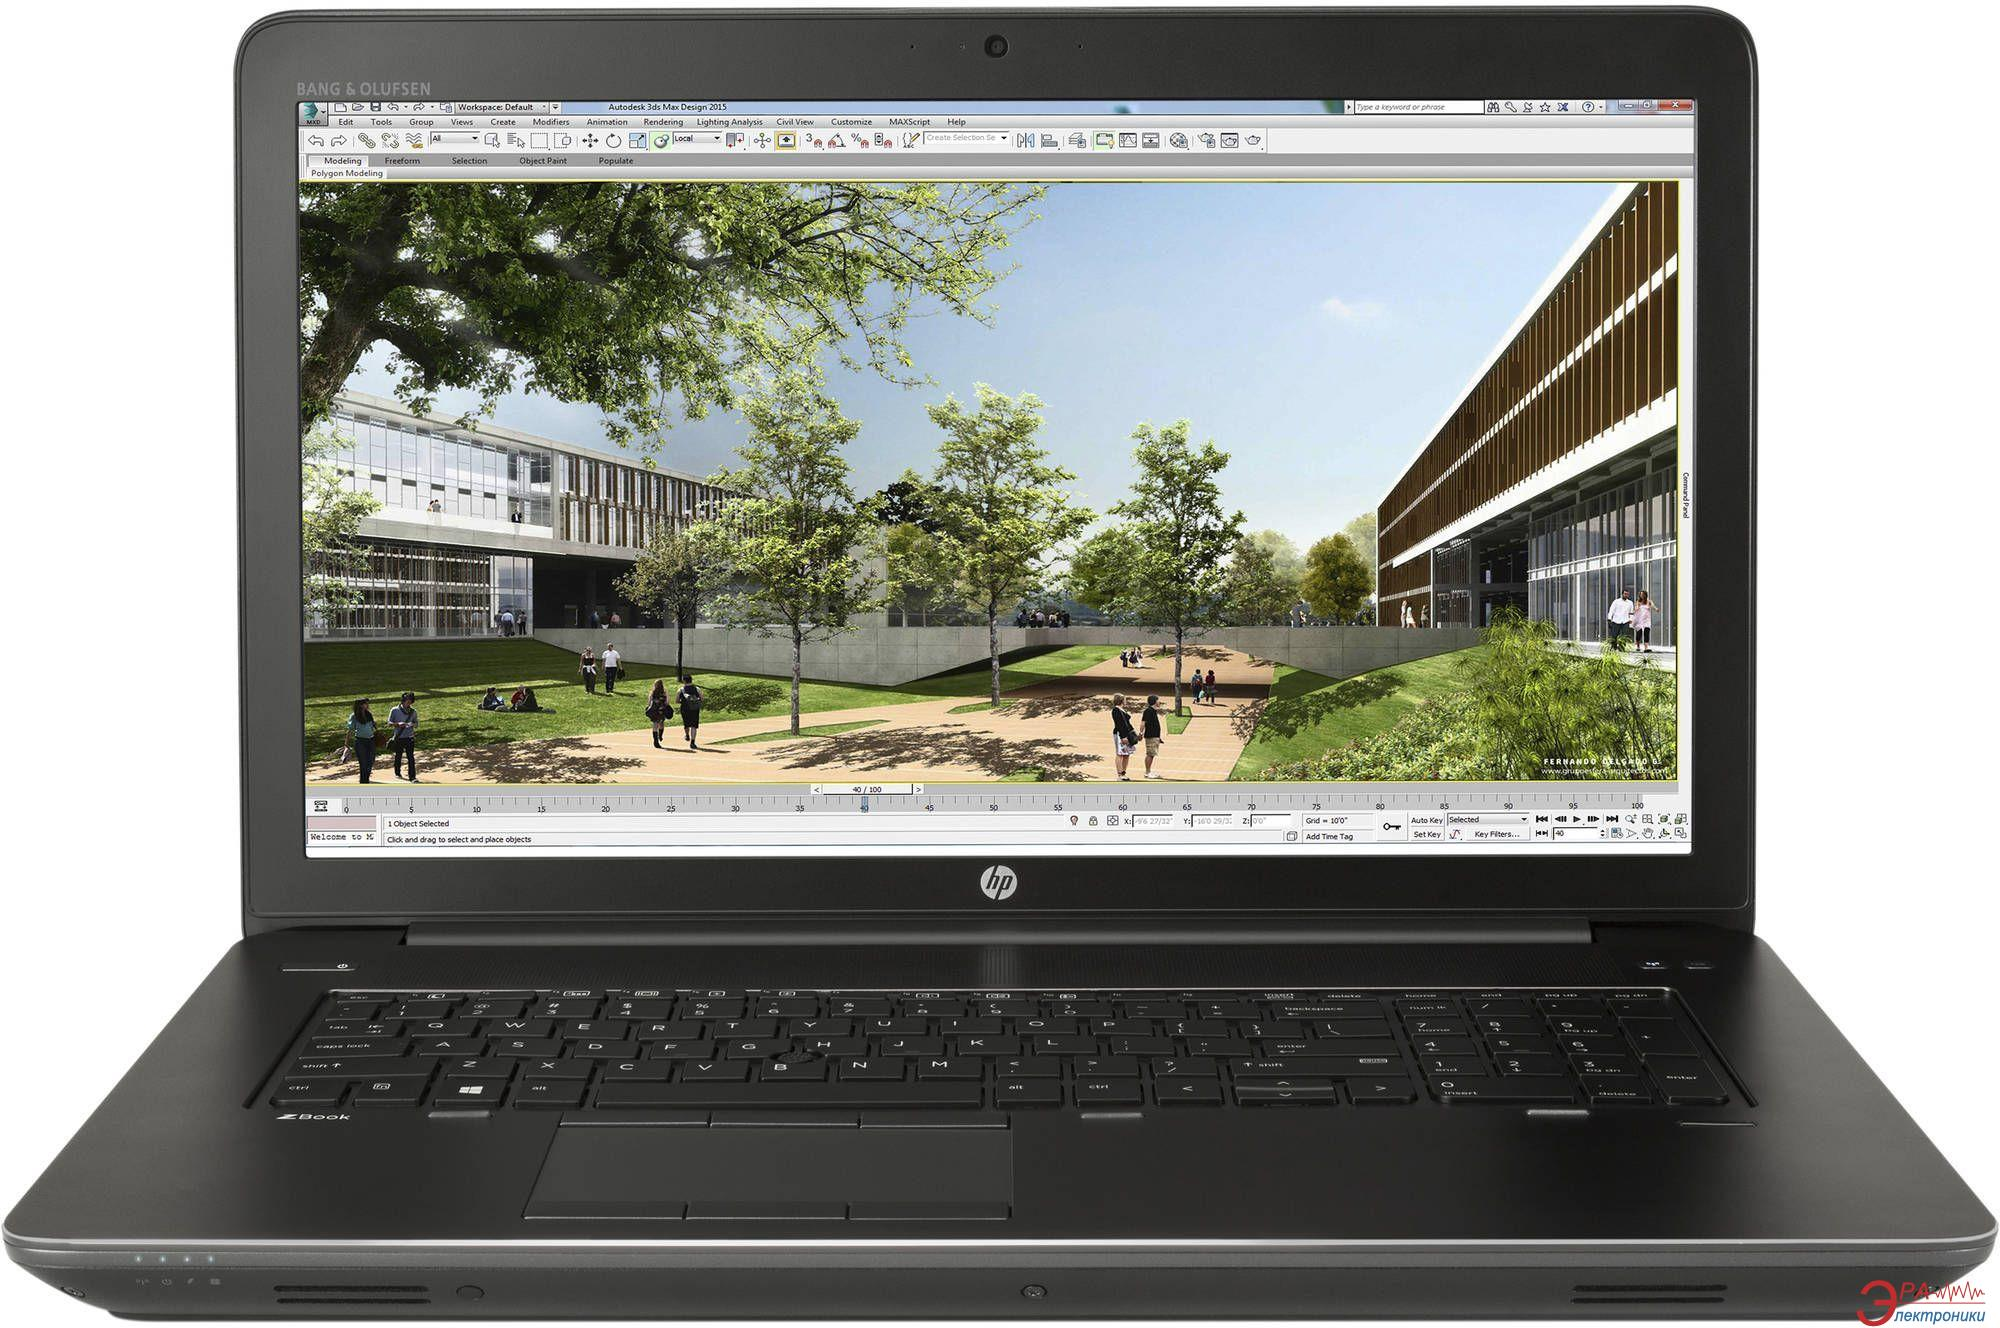 Ноутбук HP Zbook 17 (M9L91AV) Black 17,3